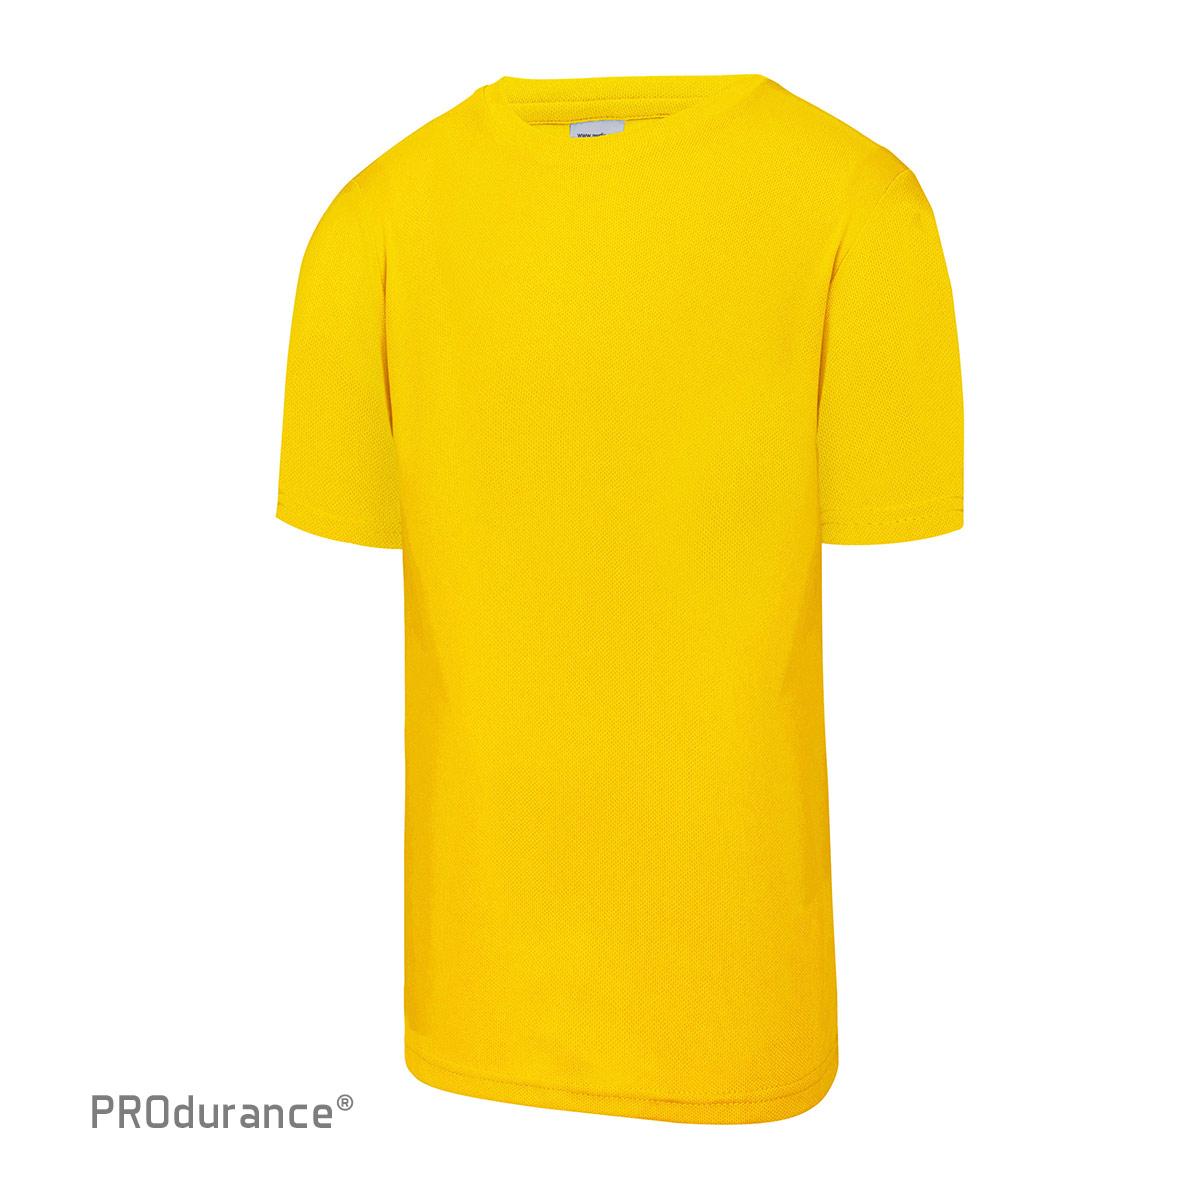 PROdurance Sportshirt - Kids